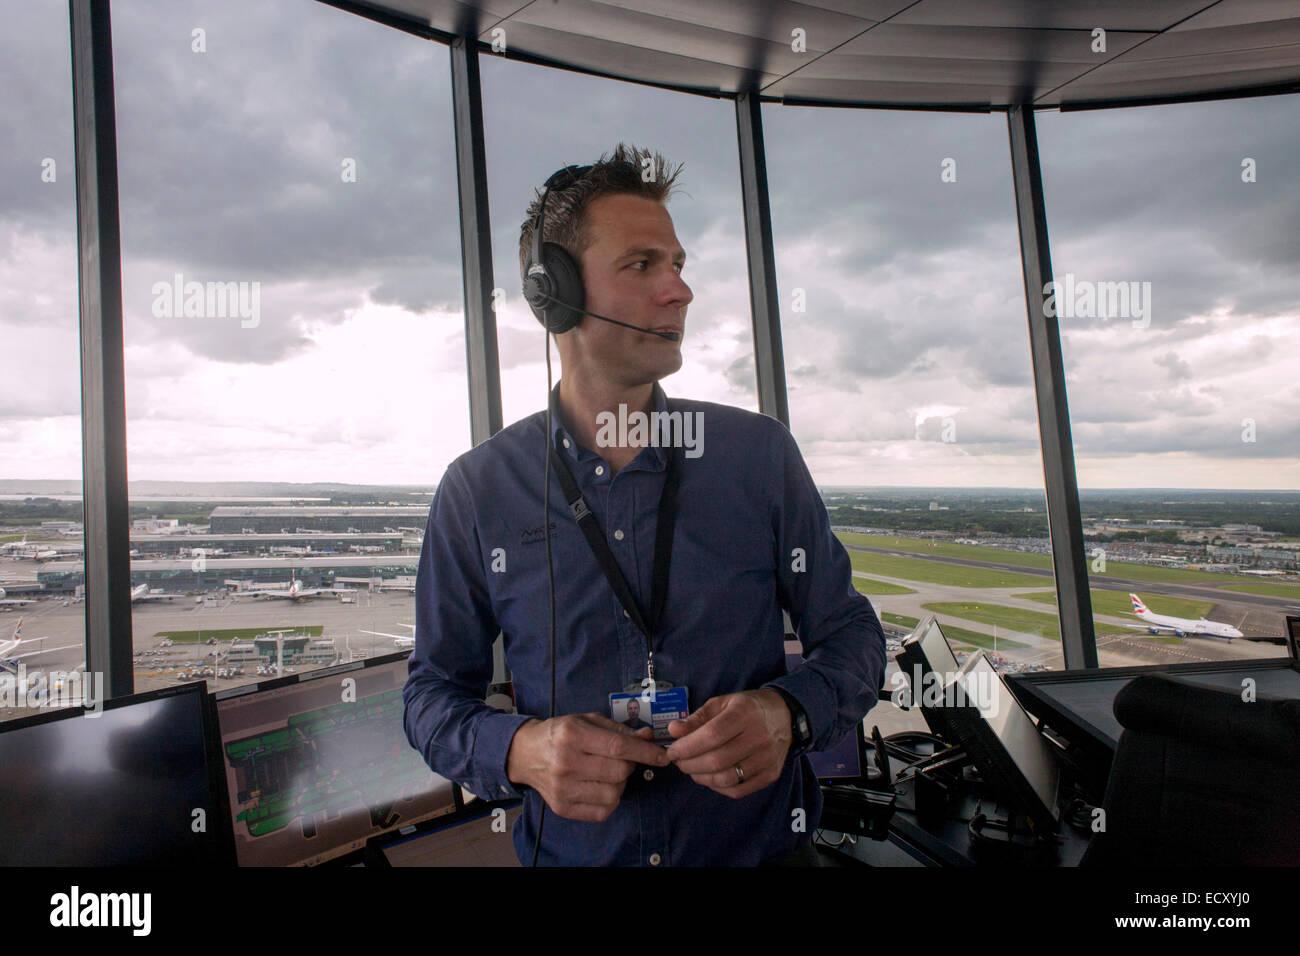 nats-heathrow-air-traffic-controller-in-